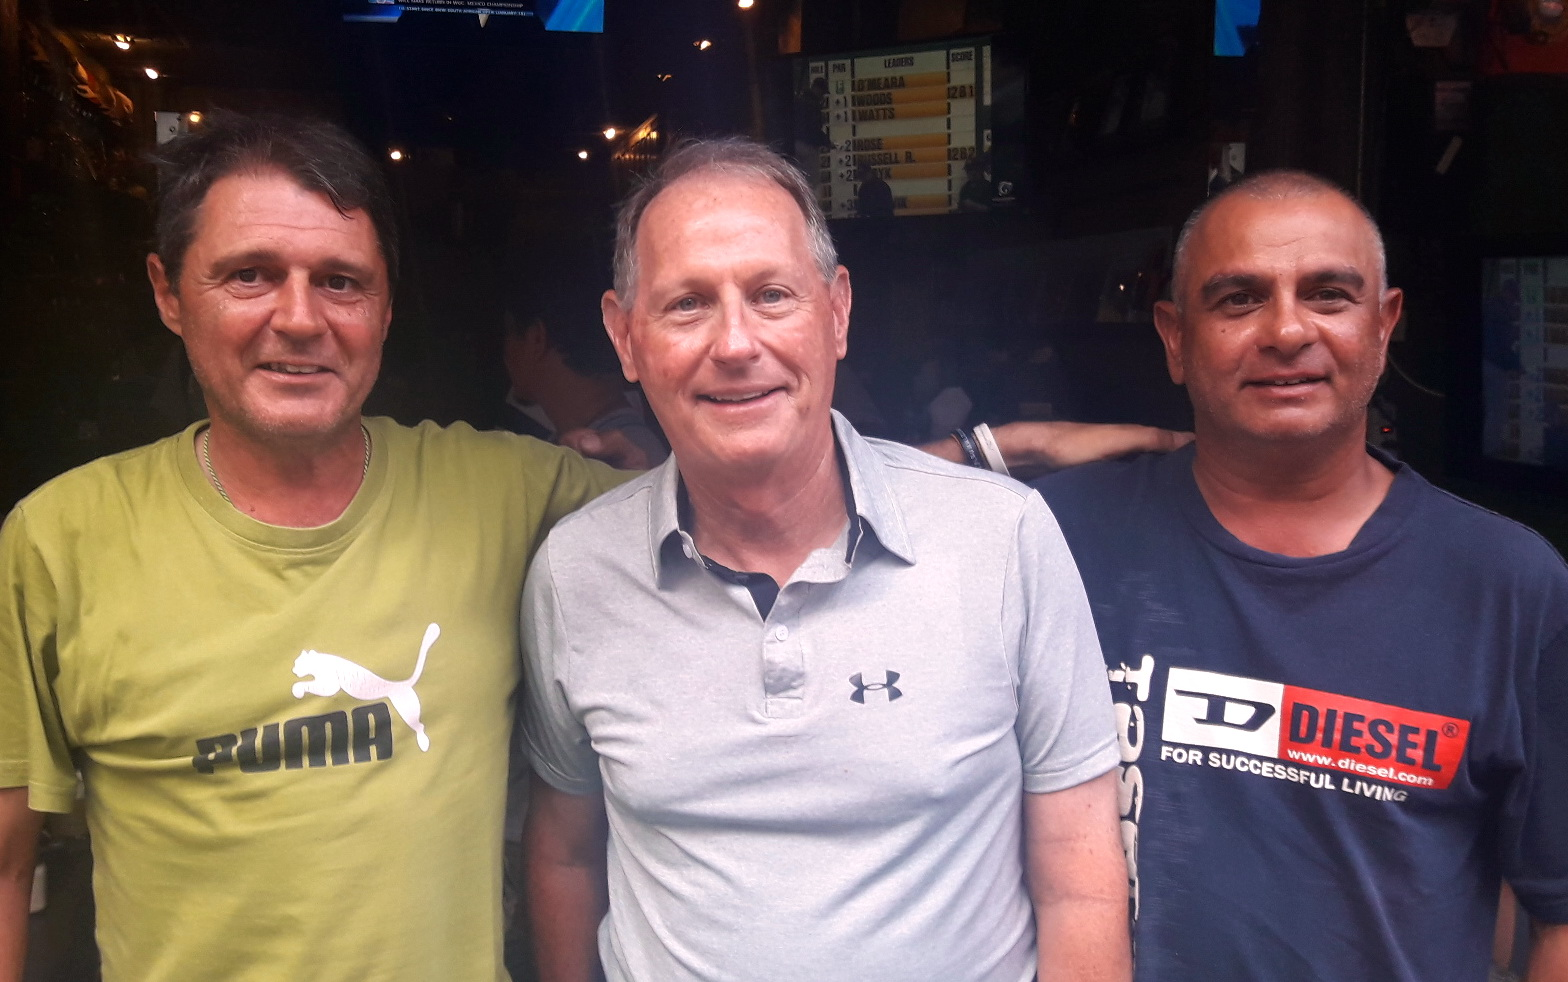 Mark Wood, Dan Dietz and Steve Sweeney.